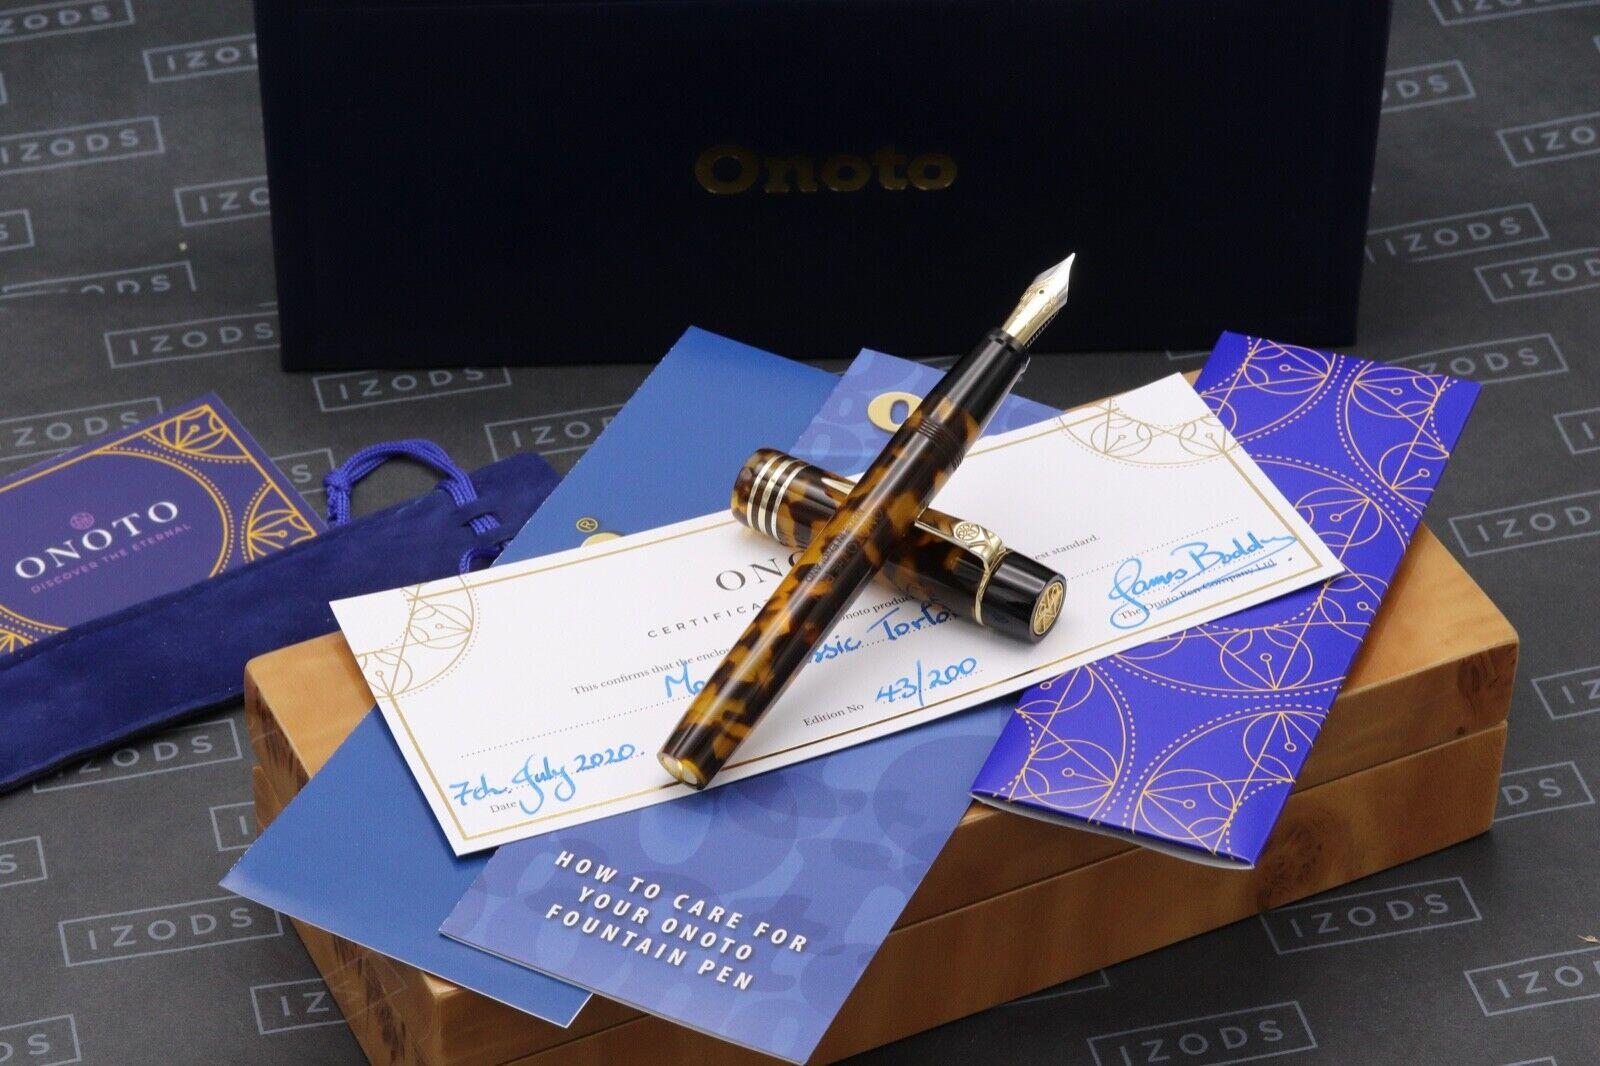 Onoto Magna Classic Tortoiseshell Fountain Pen